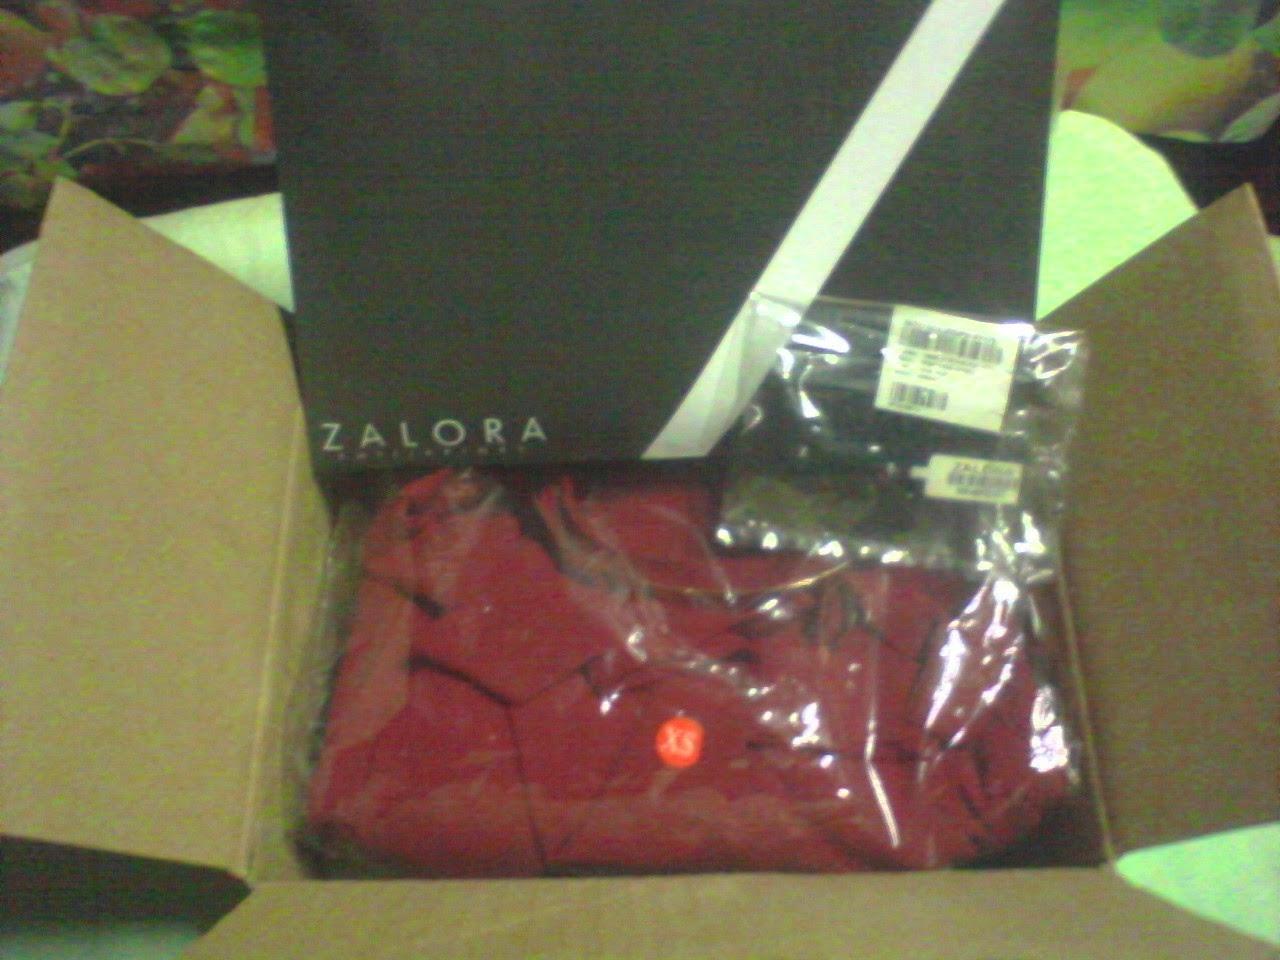 Zalora Philippines Voucher Code